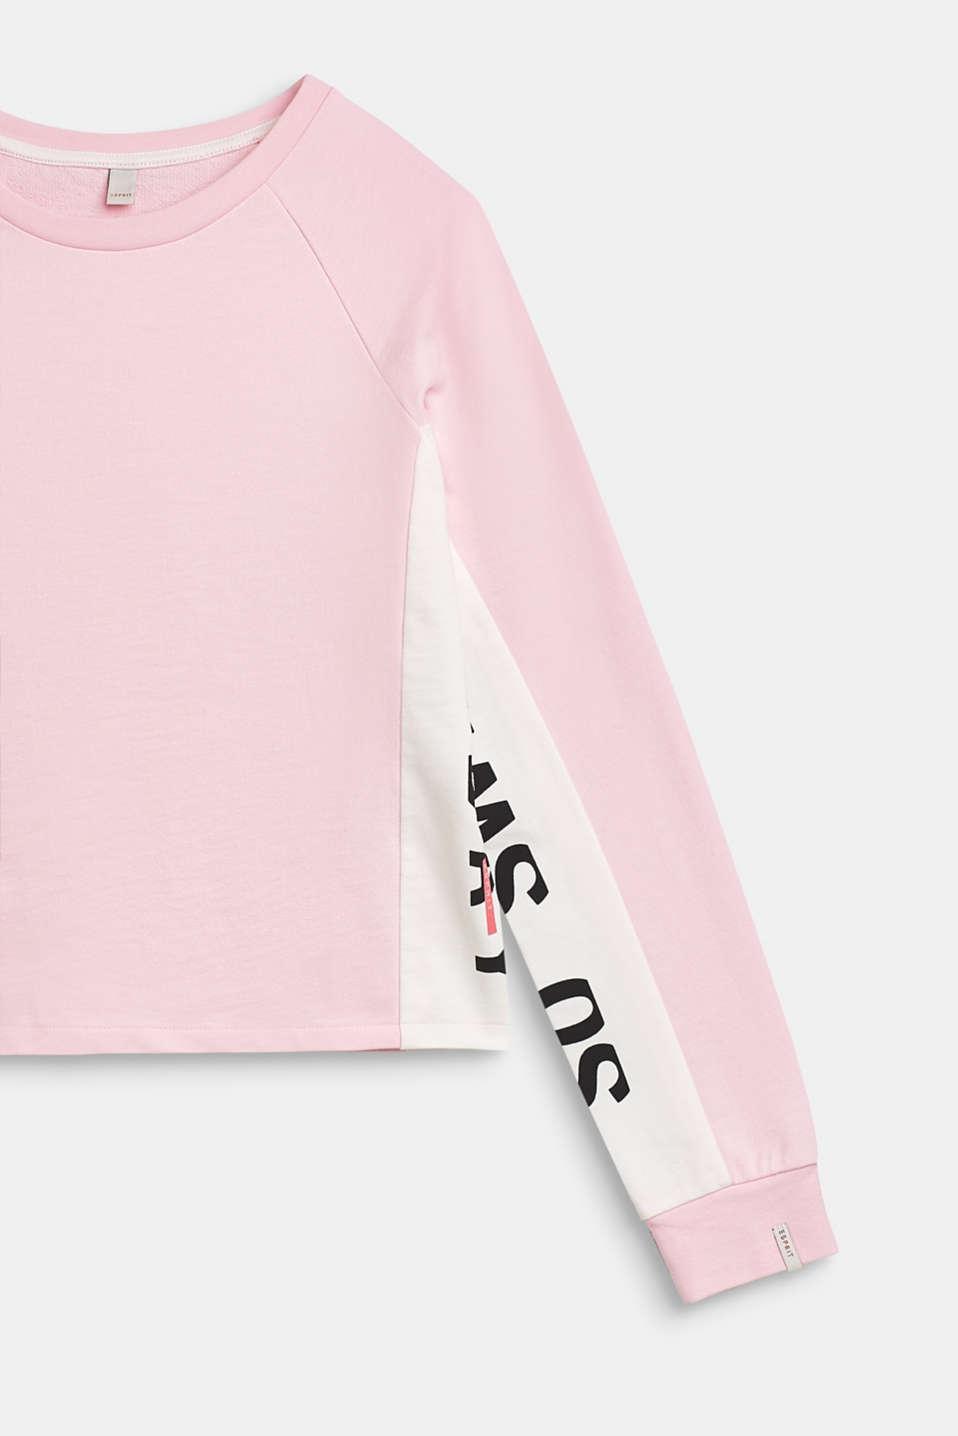 Sweatshirt with statement print, 100% cotton, LCBLUSH, detail image number 2